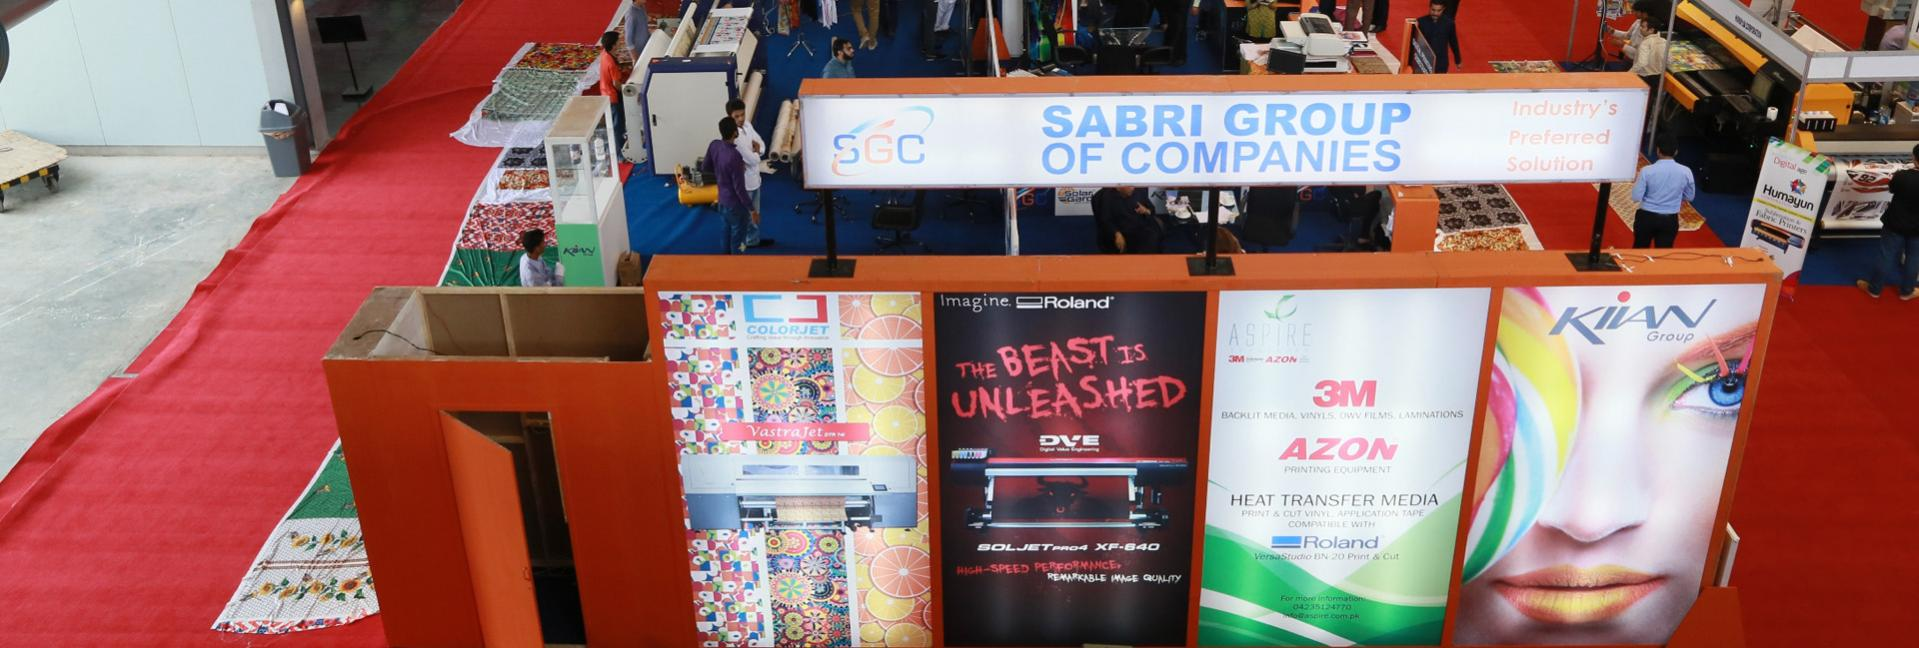 Sabri Group of Companies